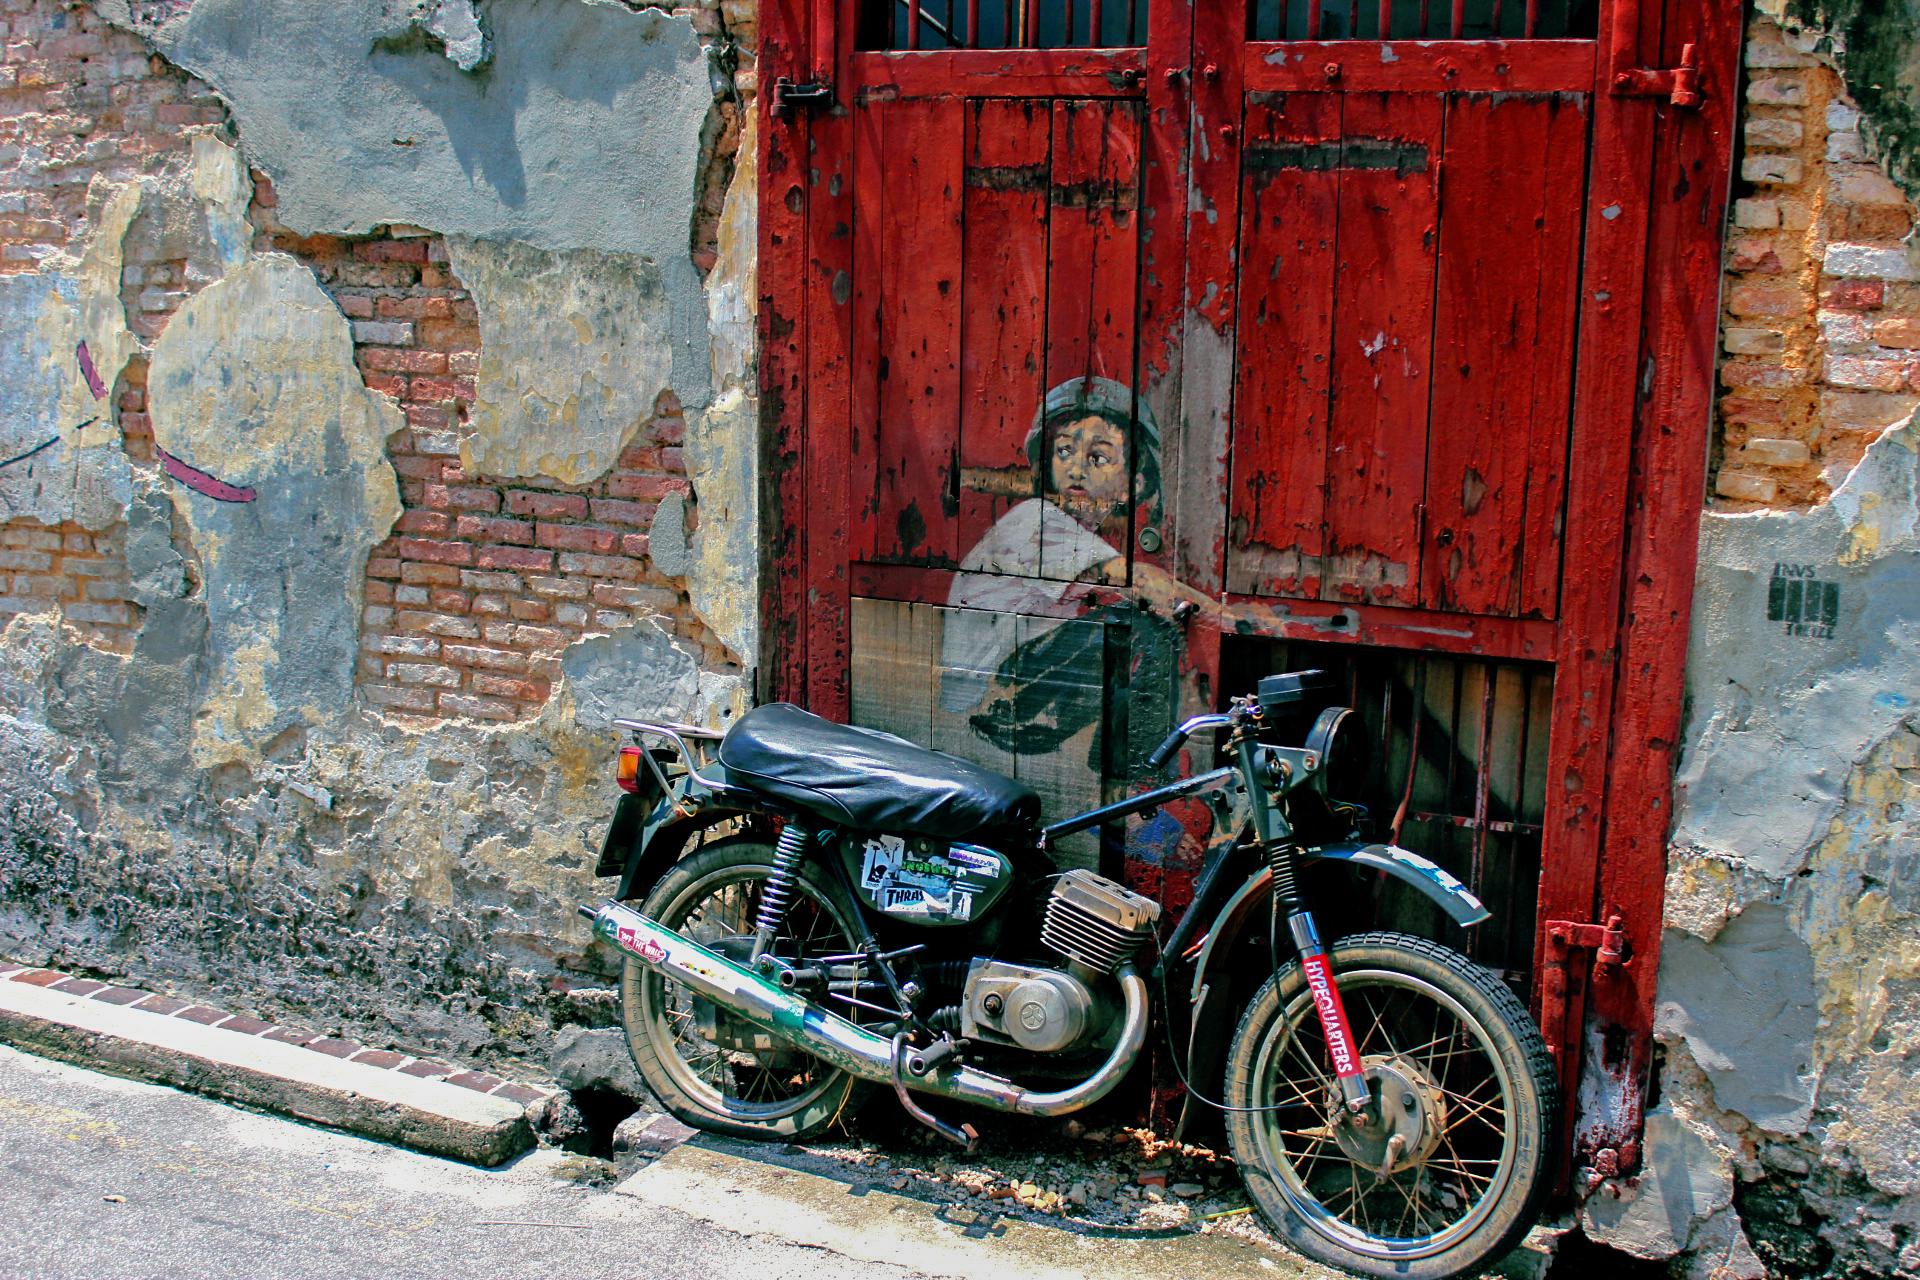 Bike, Color, Door, House, Old, HQ Photo